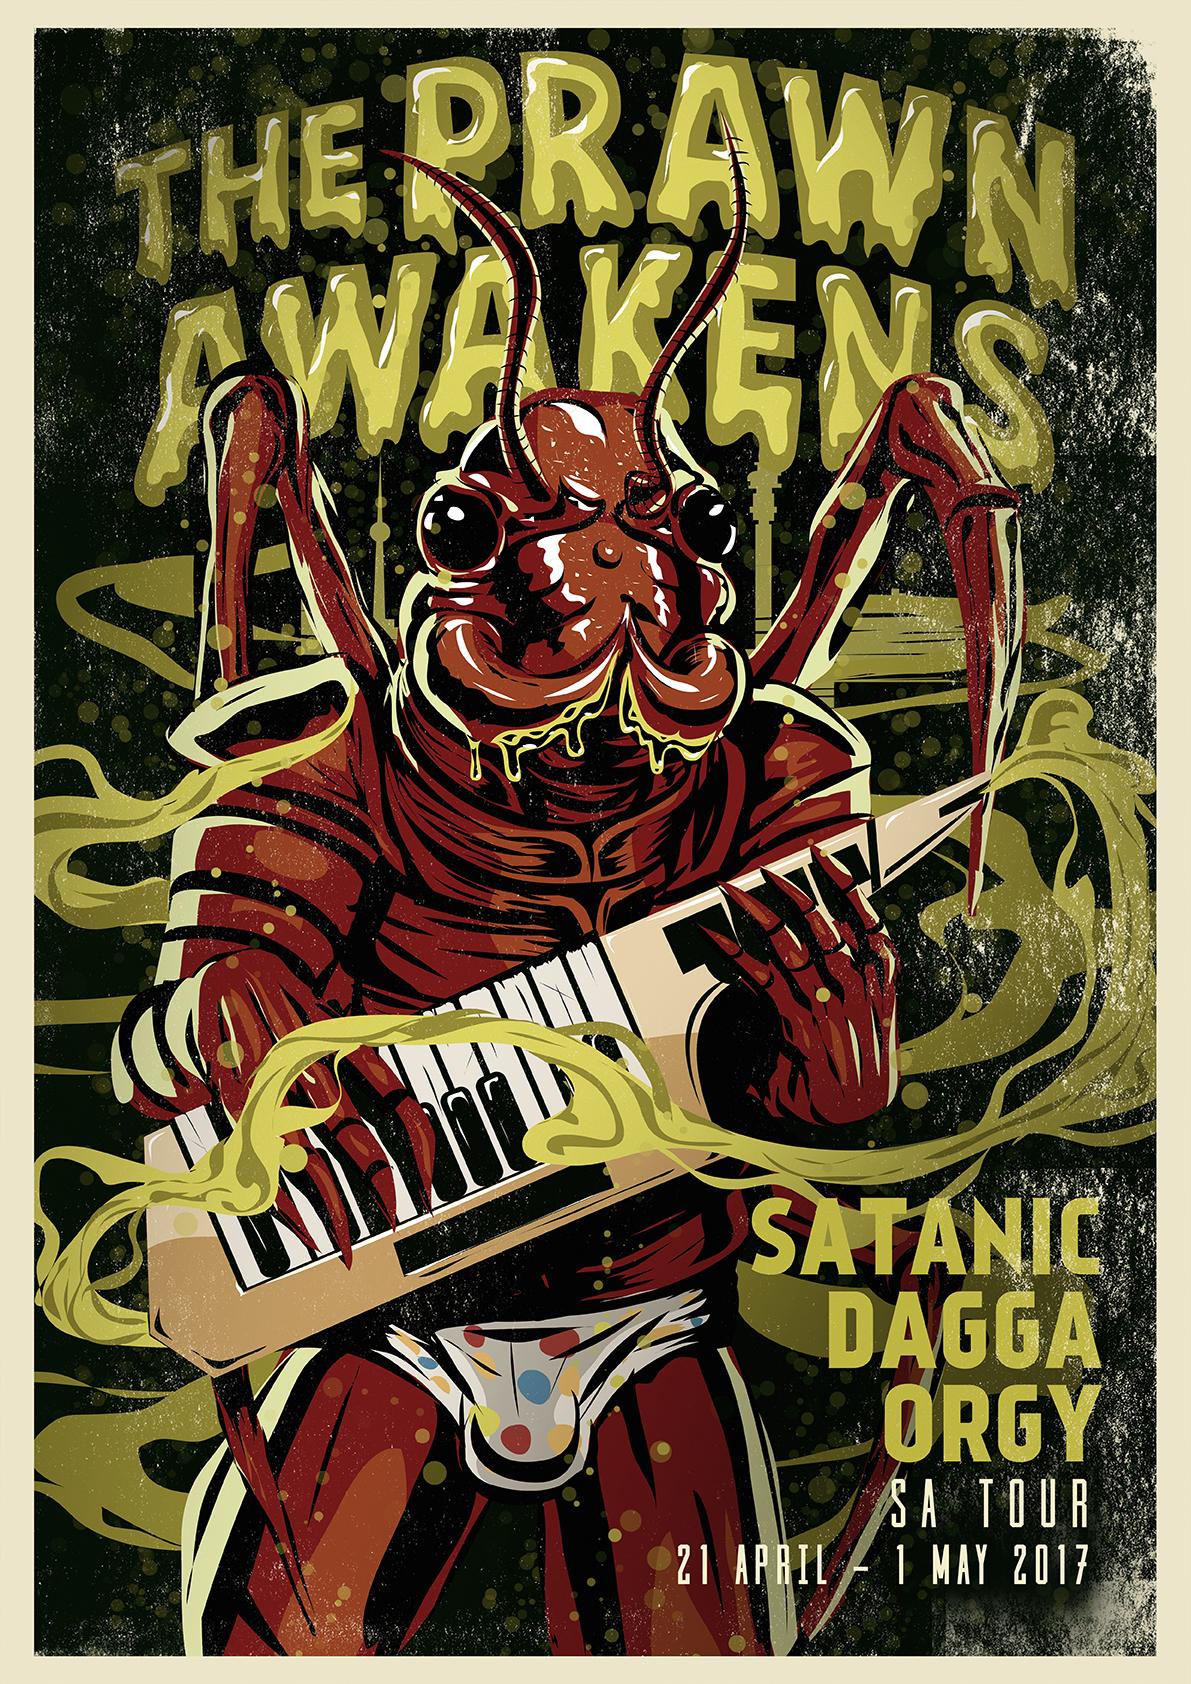 The Prawn awakens poster FB.jpg